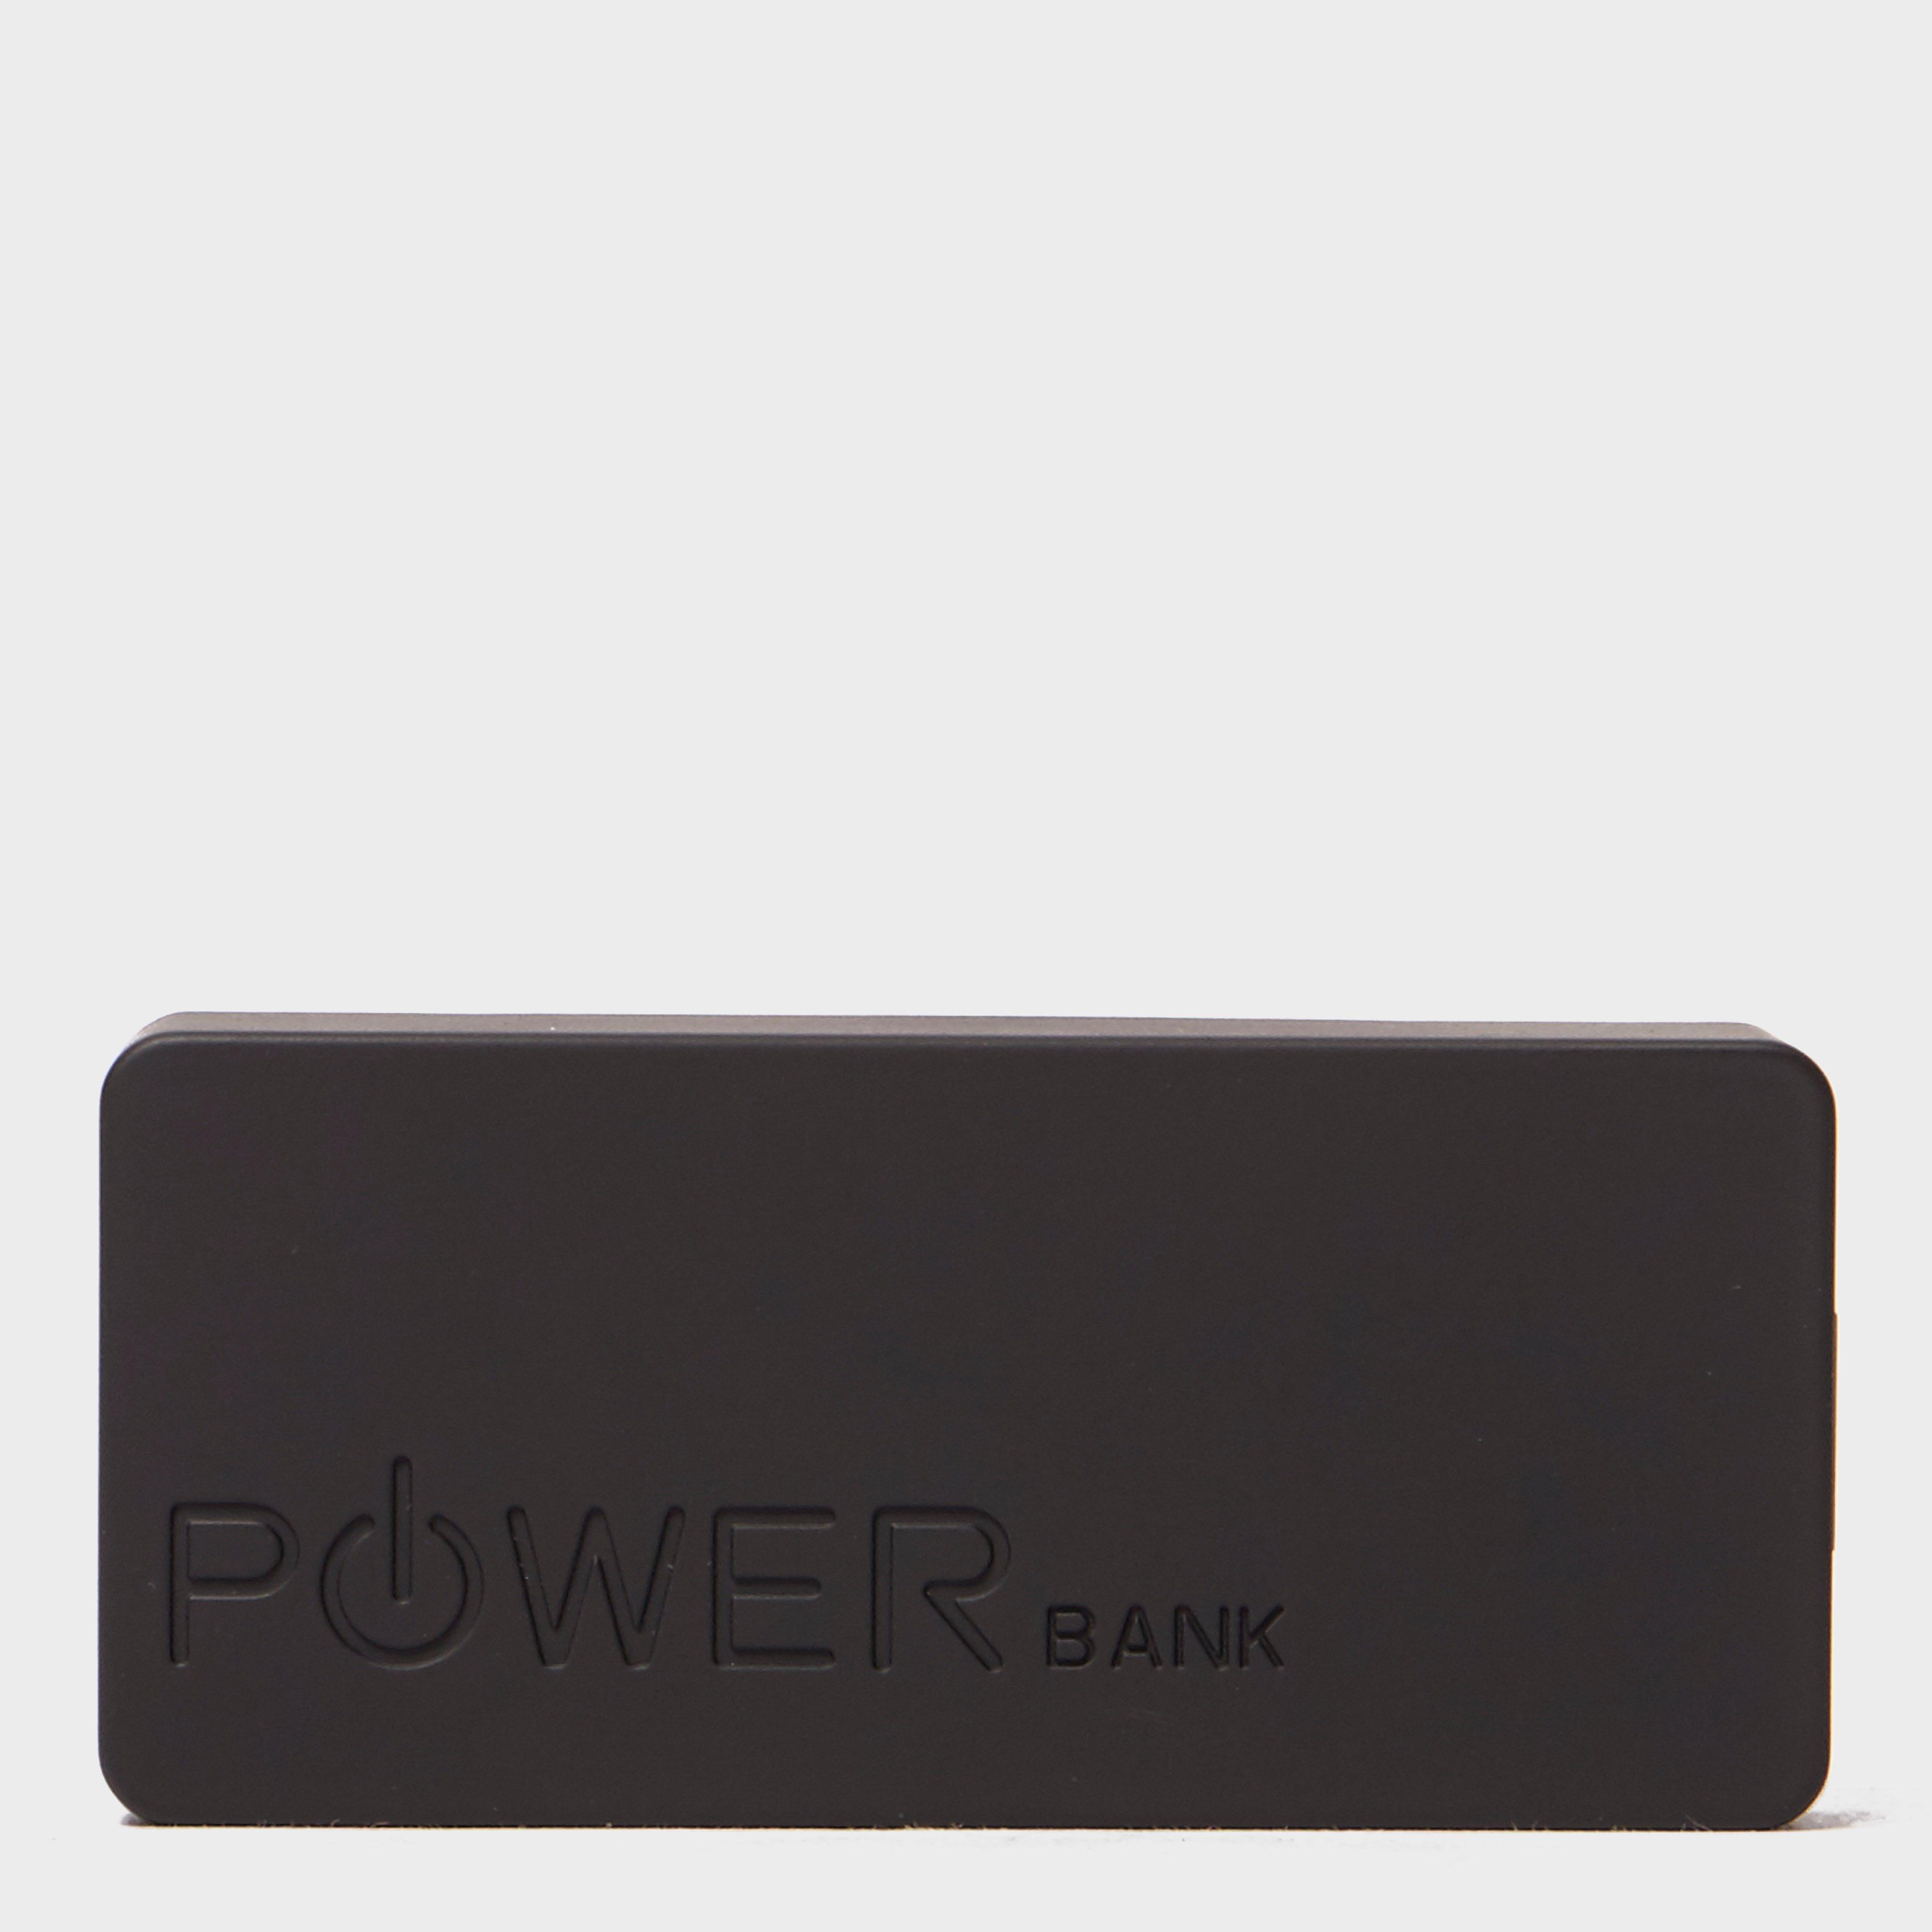 Summit Summit Juice Bank Portable Charger - Black, Black